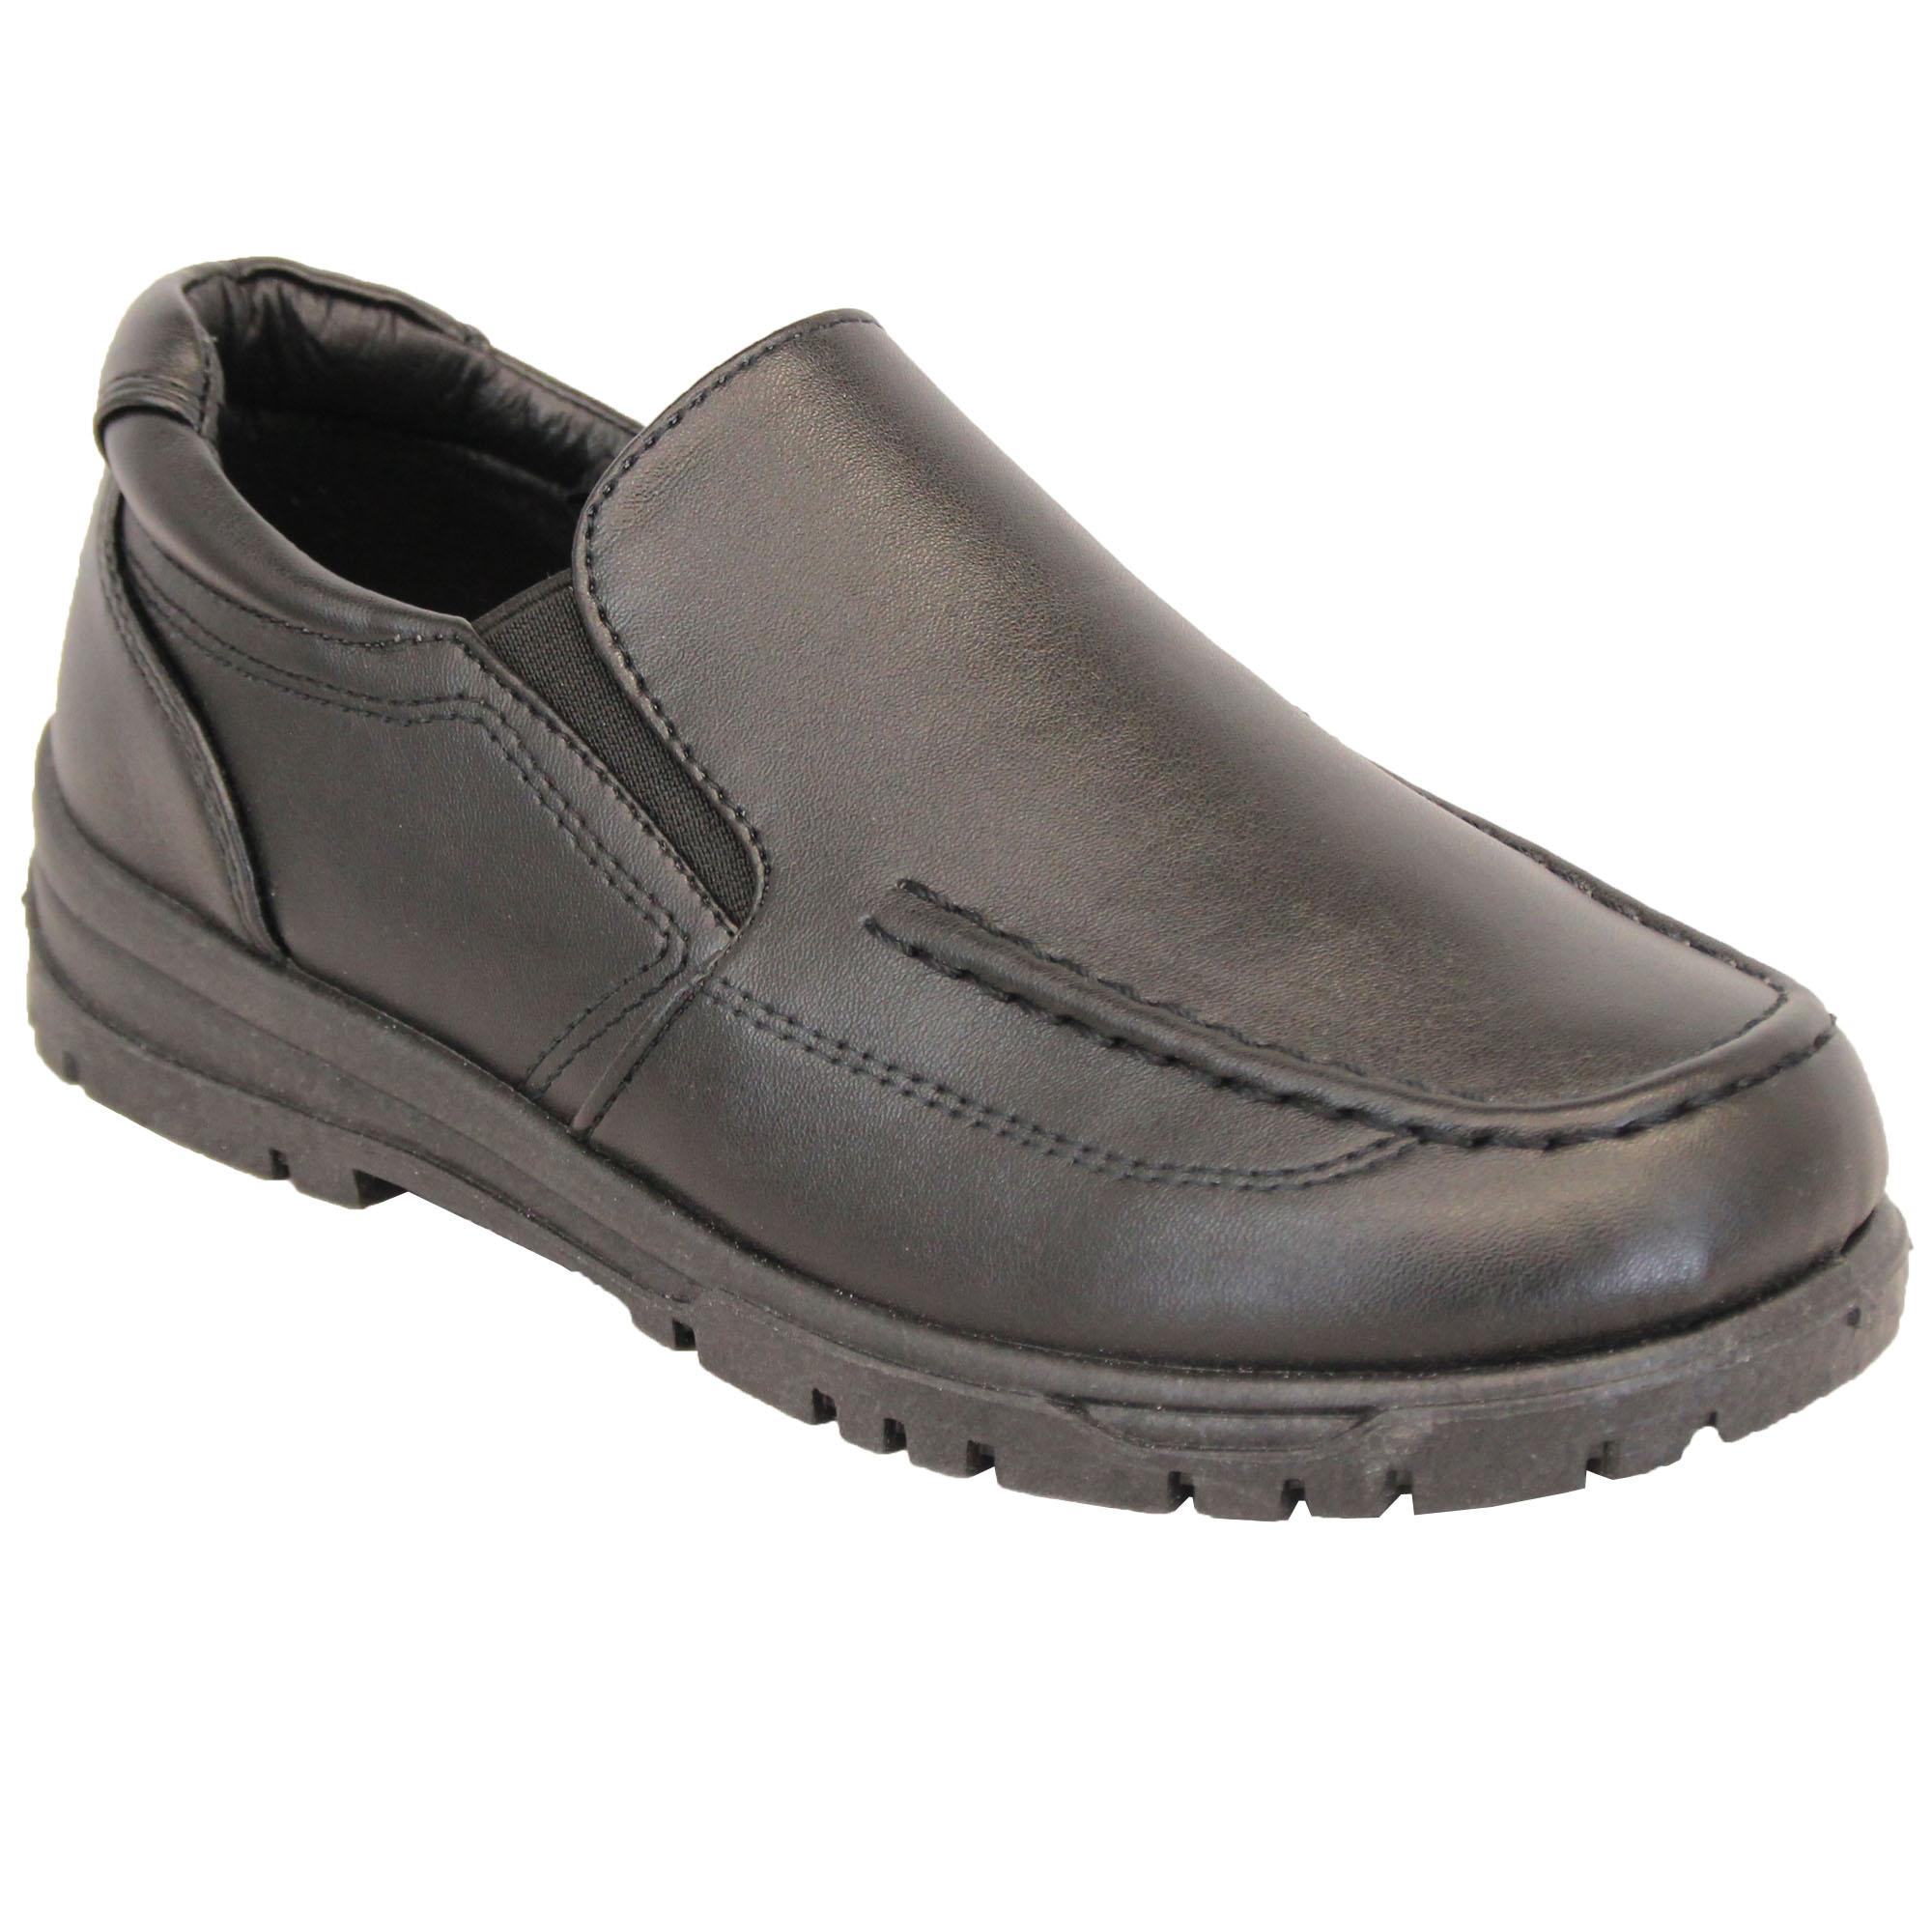 Boys School Shoes Kids Formal Slip On